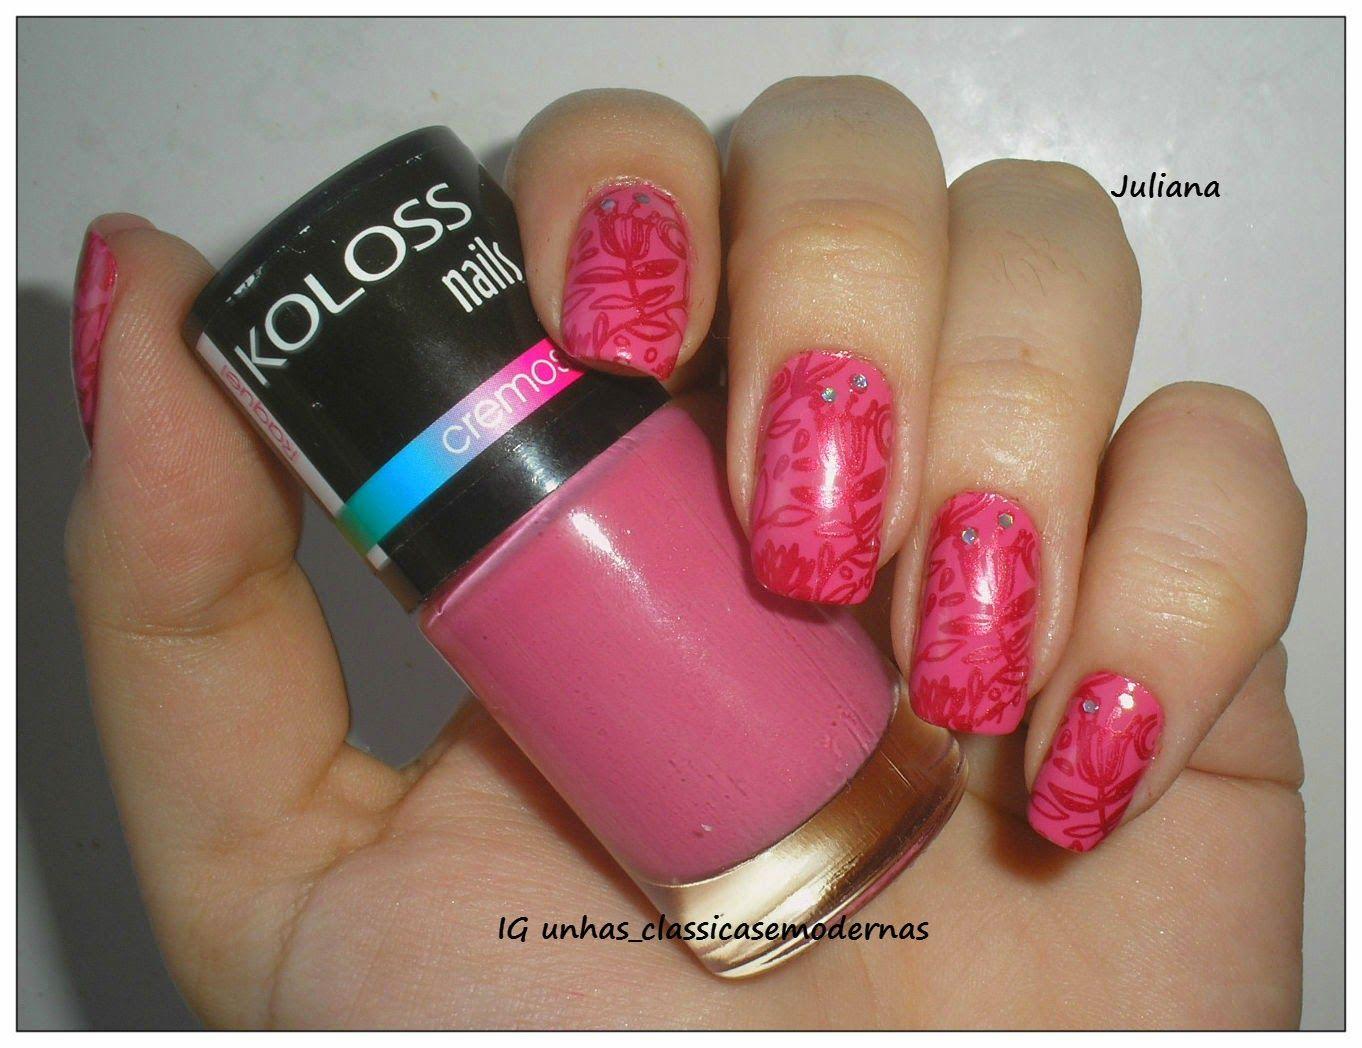 http://unhasclassicasemodernas.blogspot.com.br/2015/04/plaquinha-qa-82-born-pretty-store.html